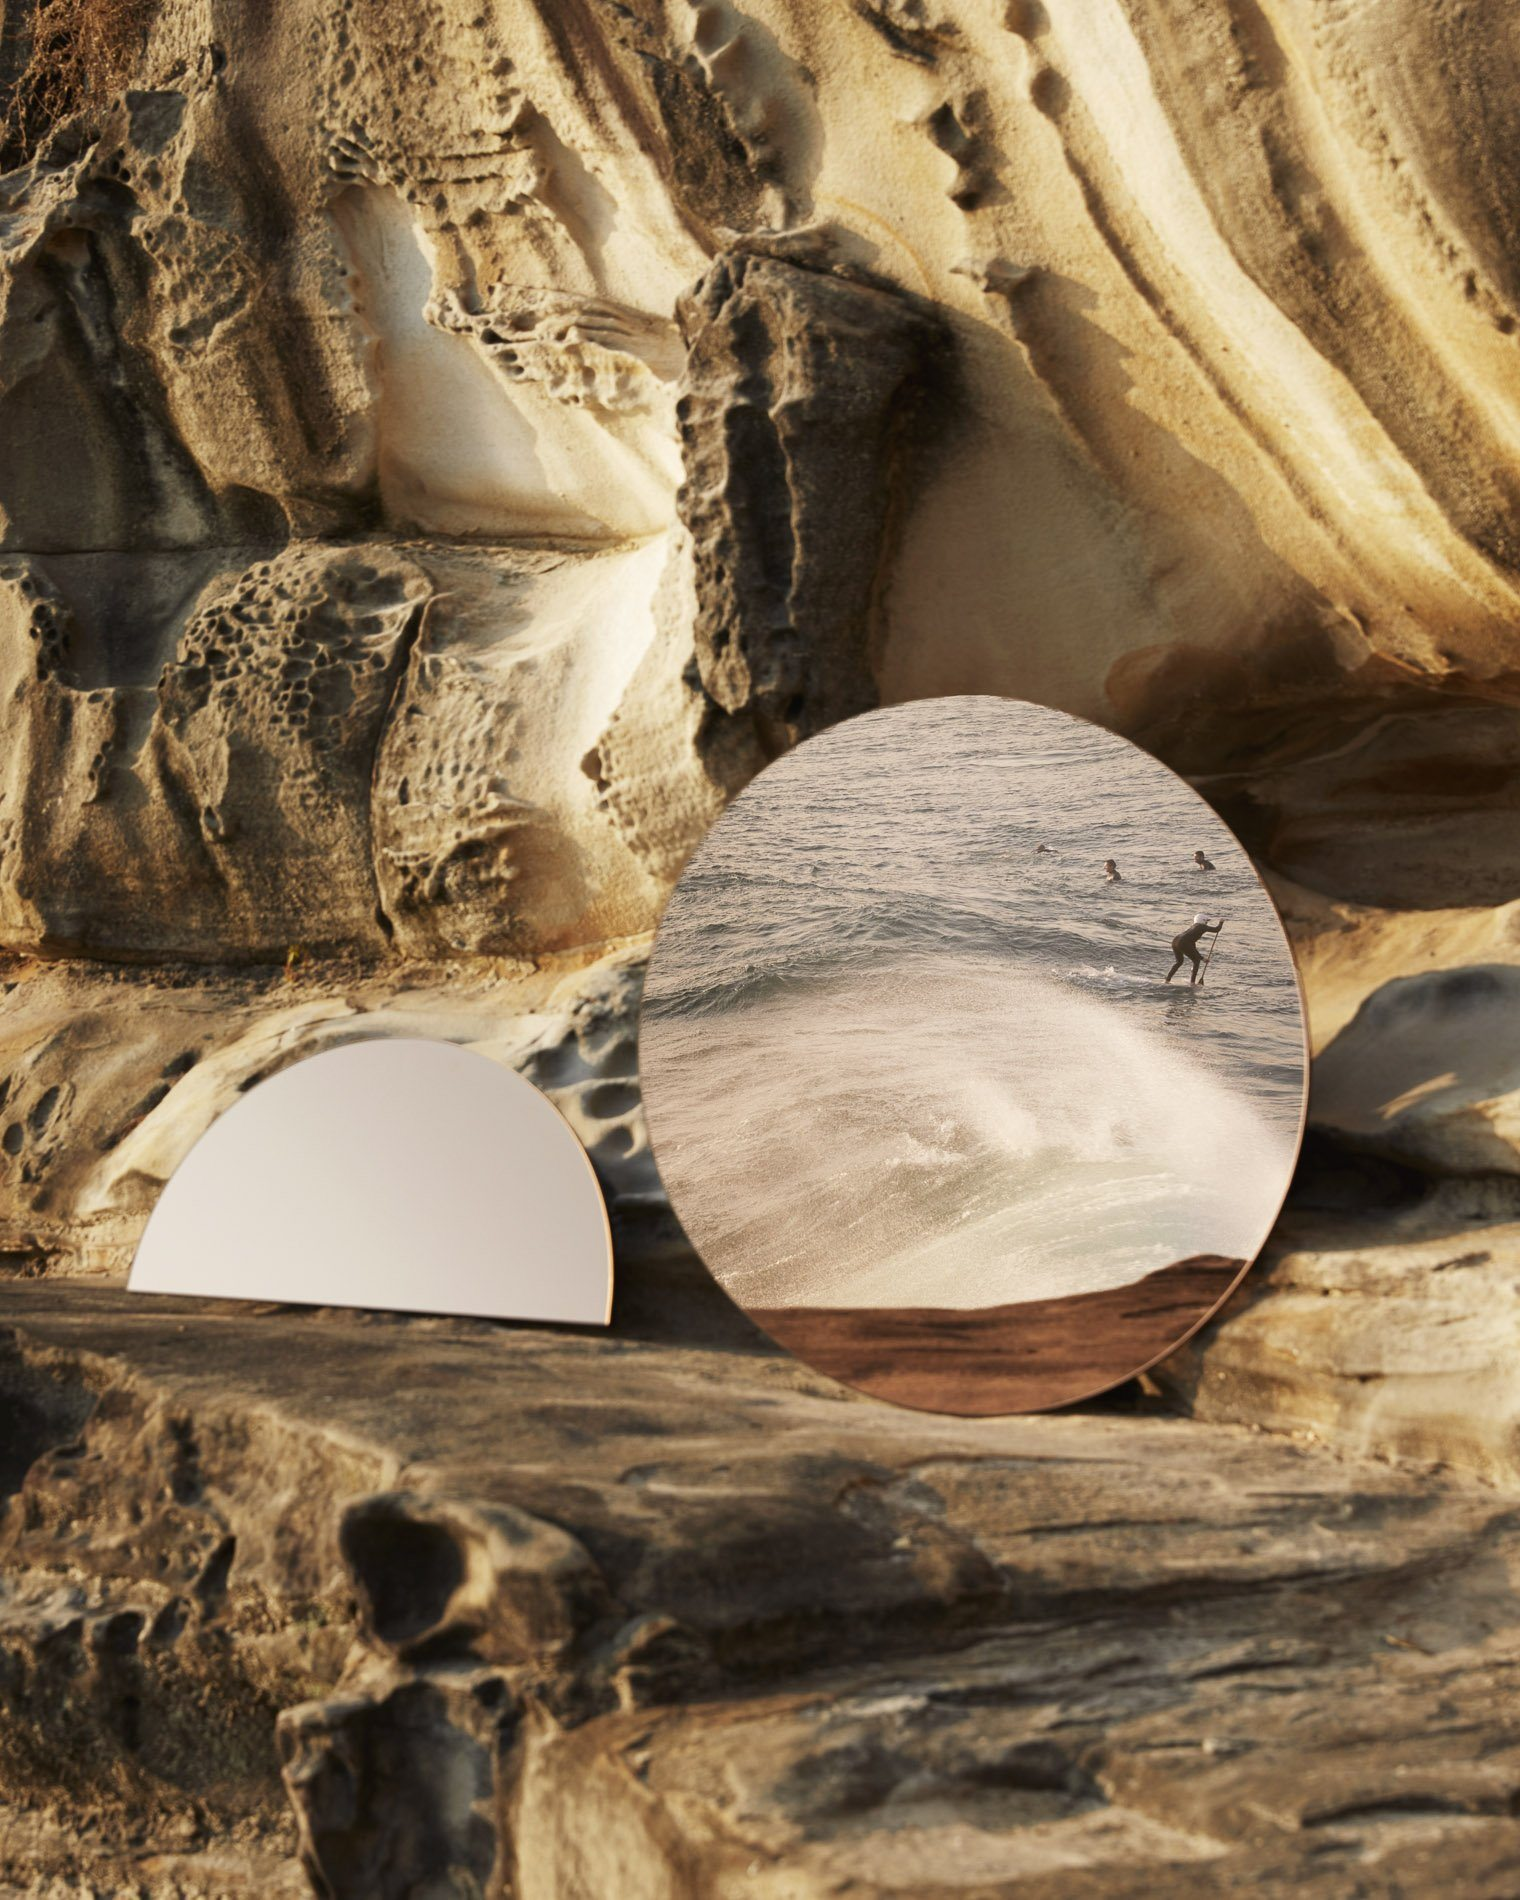 iGNANT-Design-Sarah-Ellison-The-New-Wave-006